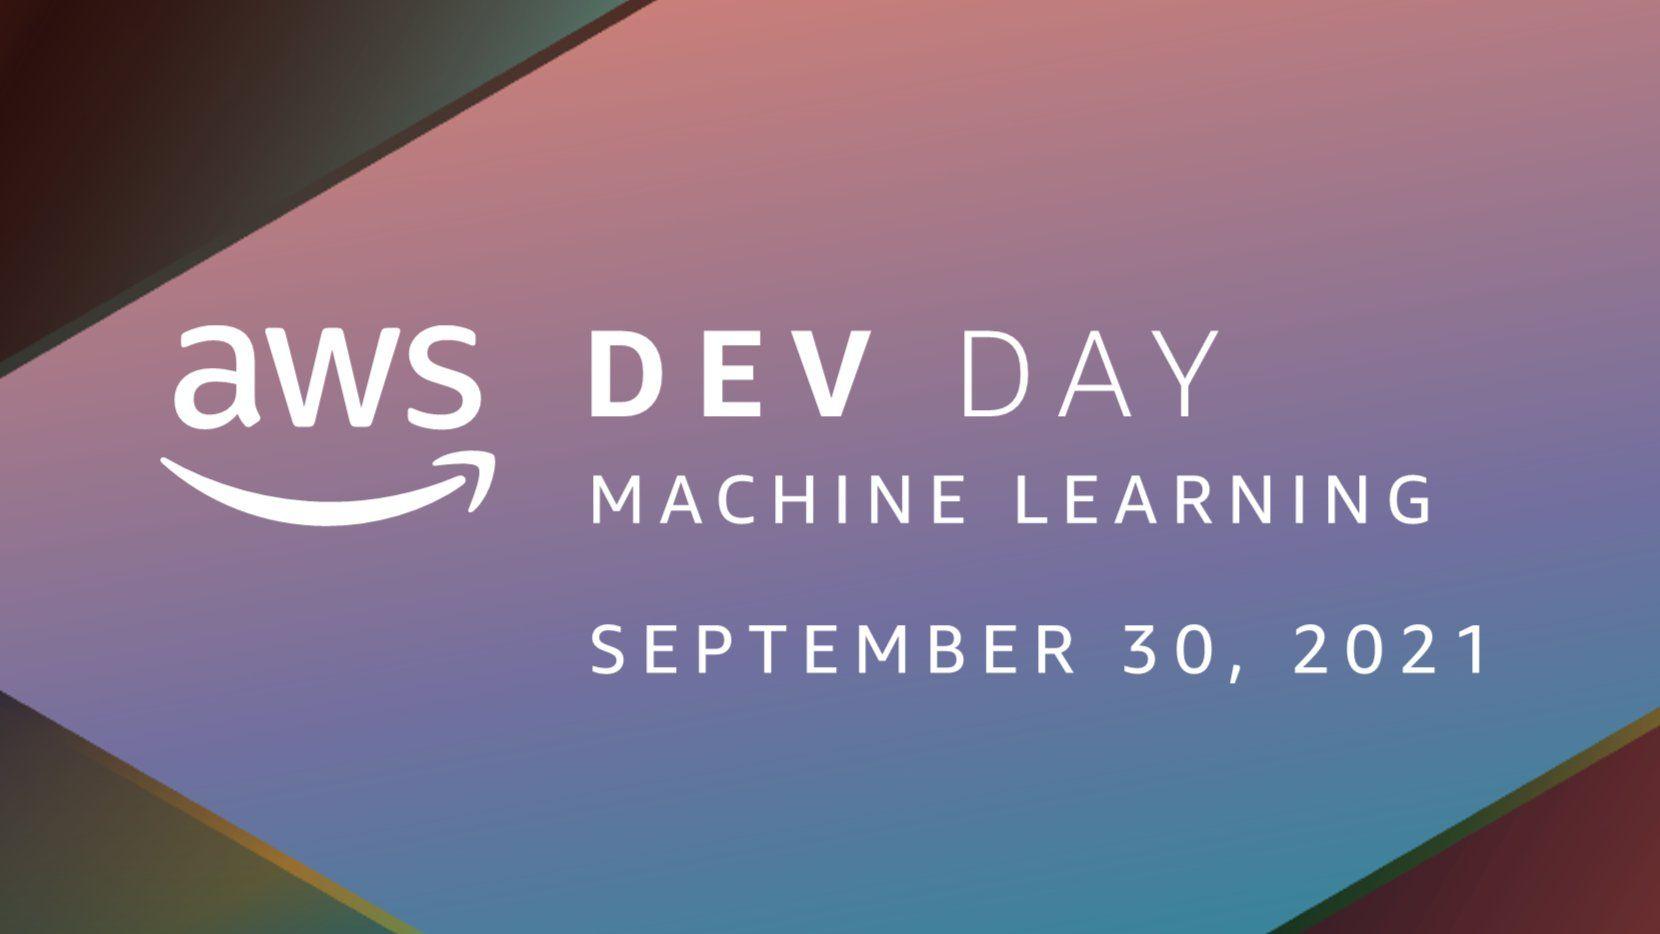 AWS Dev Day Machine Learning